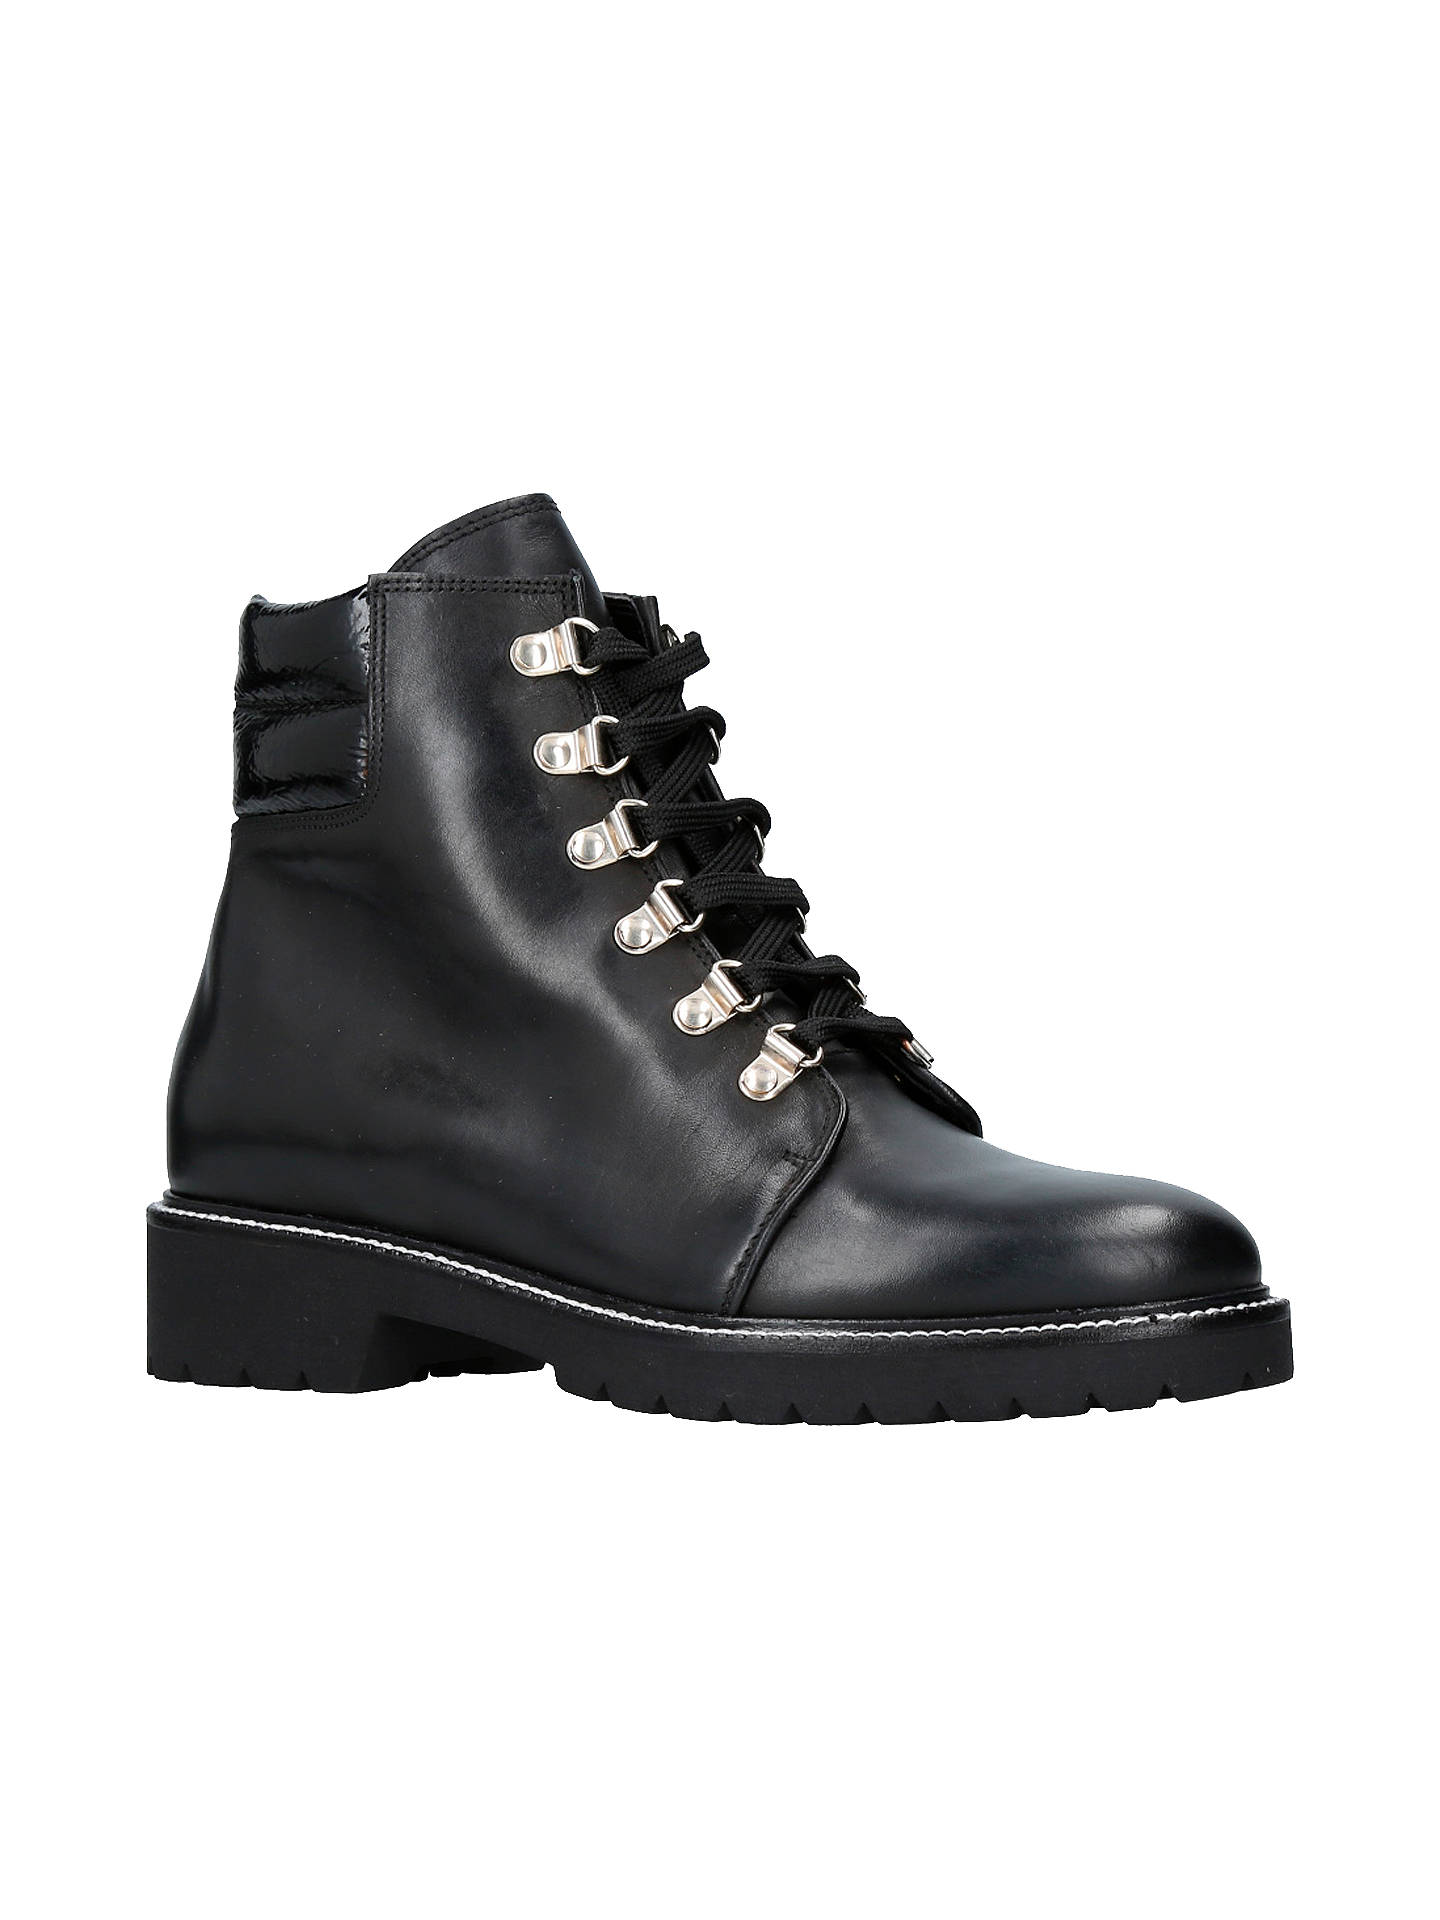 54f4af7cf9e Carvela Stroll Lace Up Ankle Boots at John Lewis   Partners